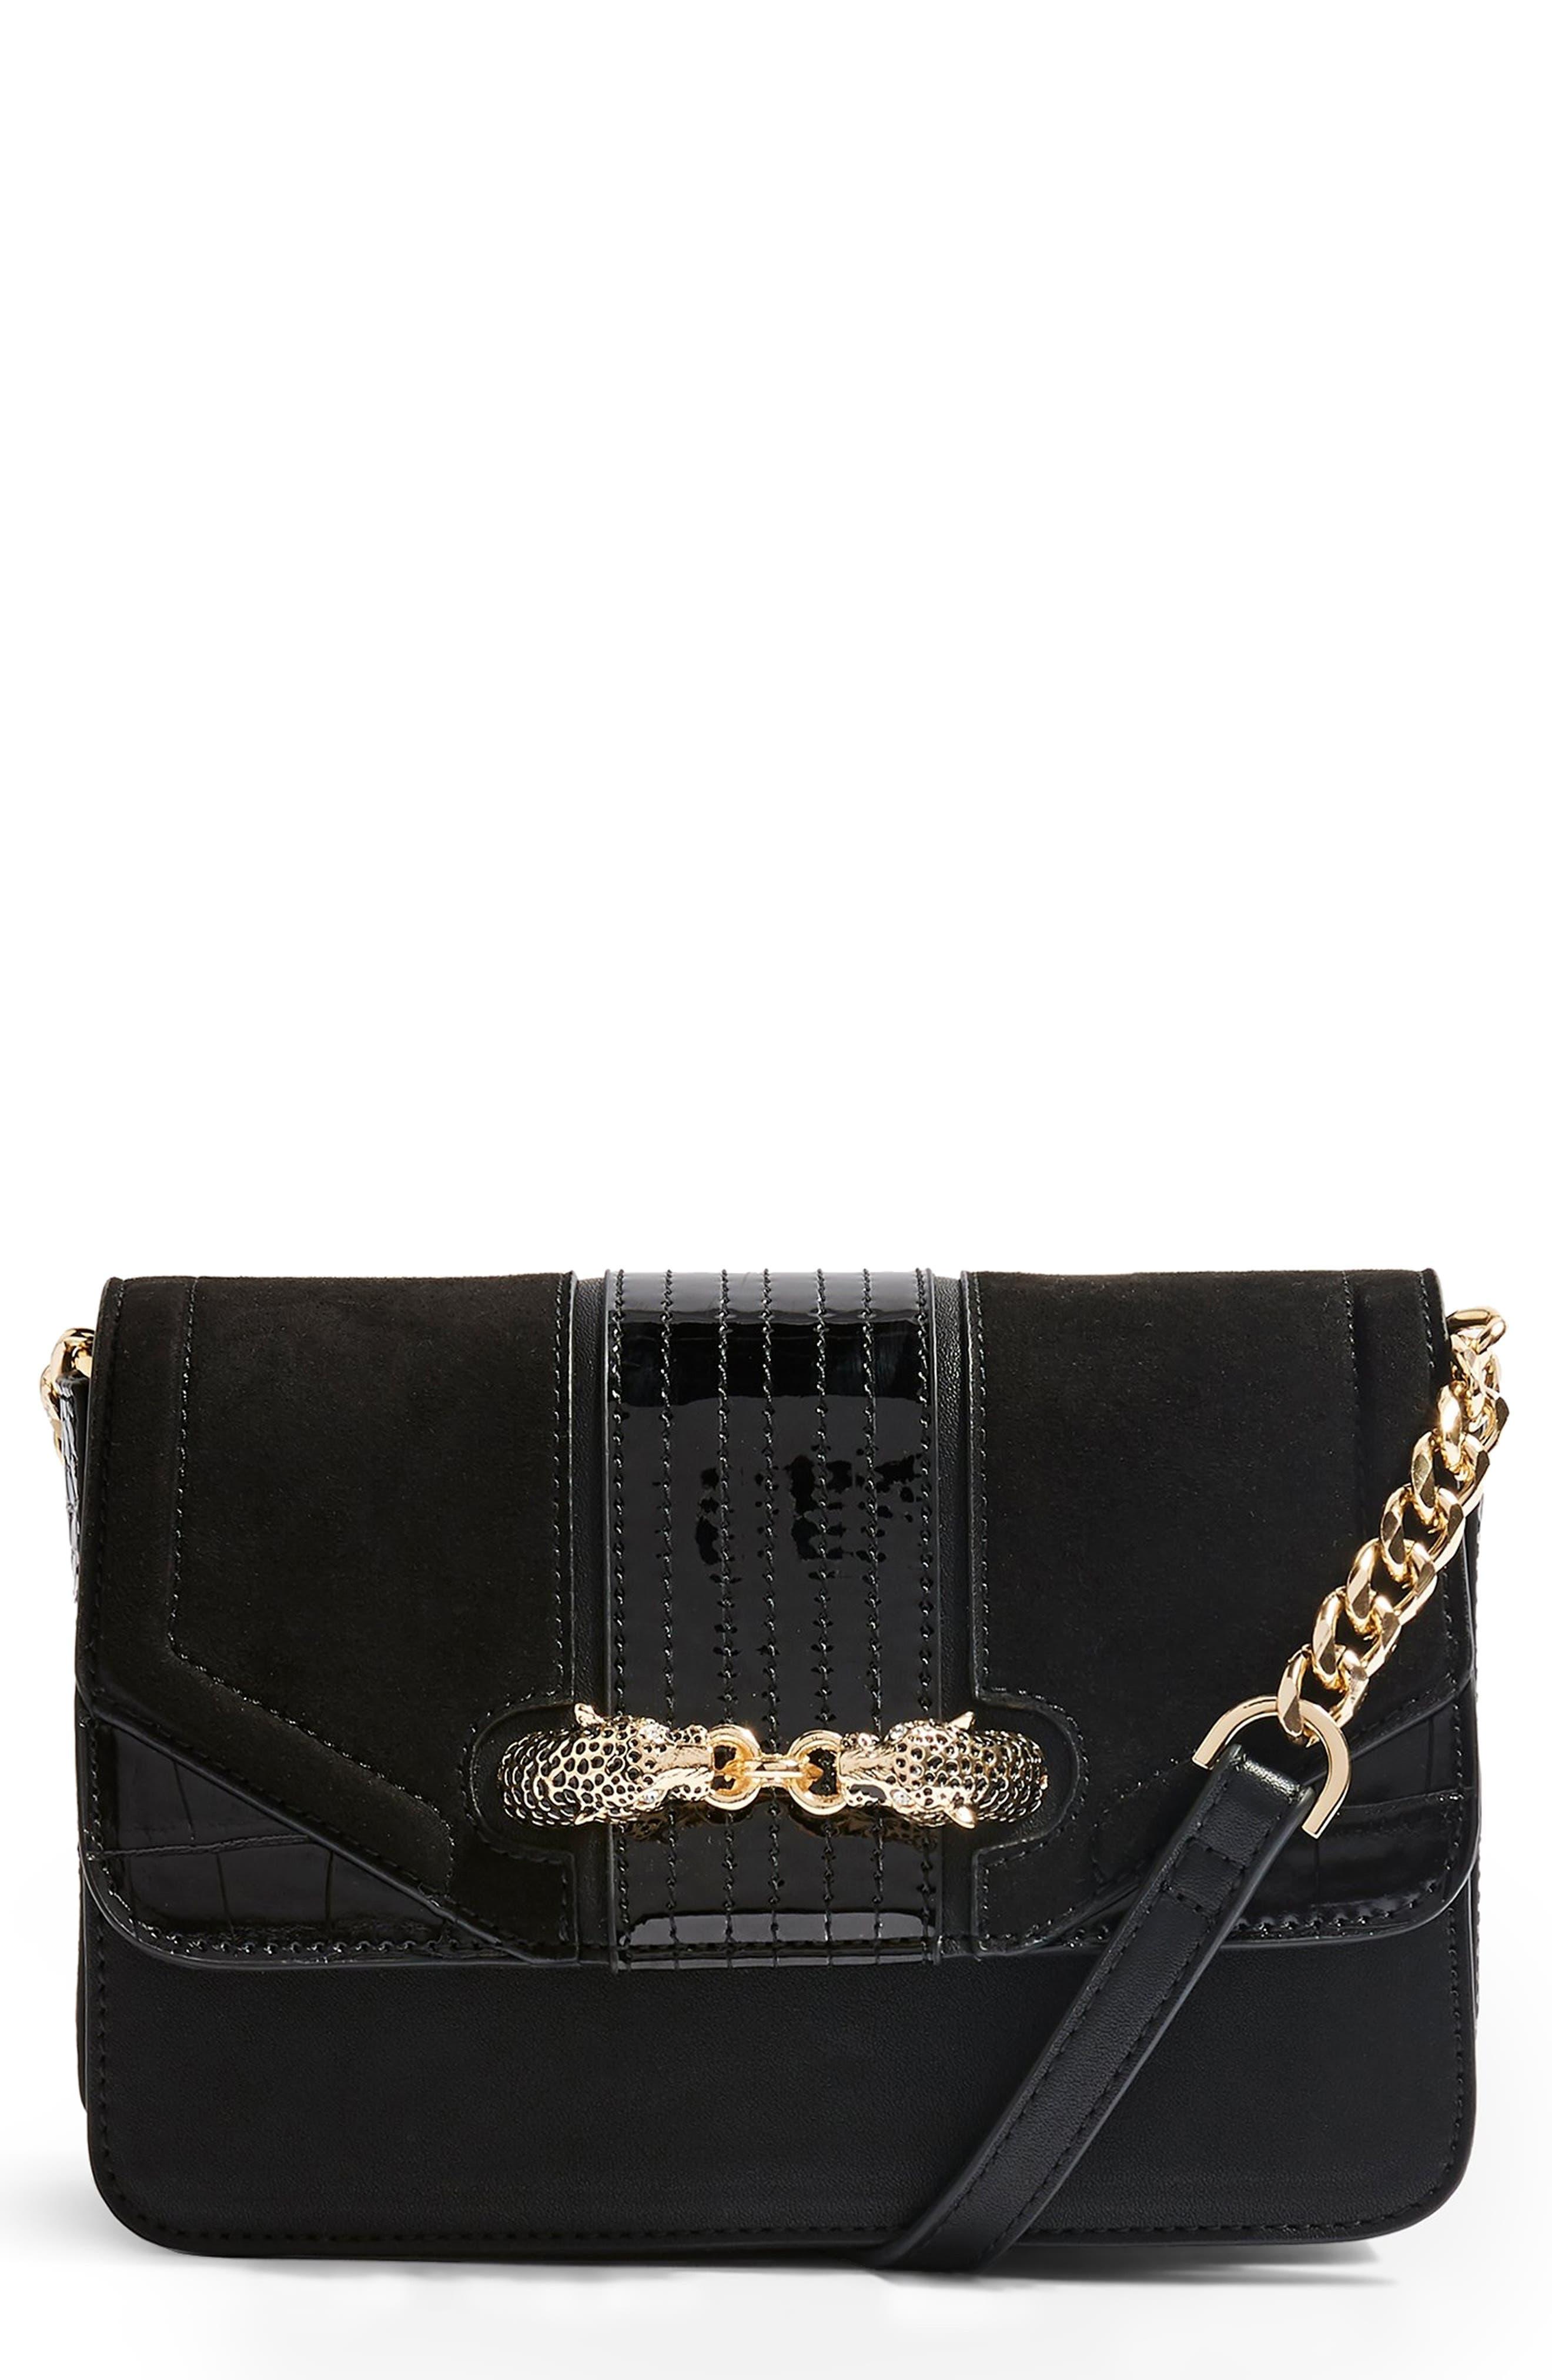 TOPSHOP, Cheetah Crossbody Bag, Main thumbnail 1, color, BLACK MULTI